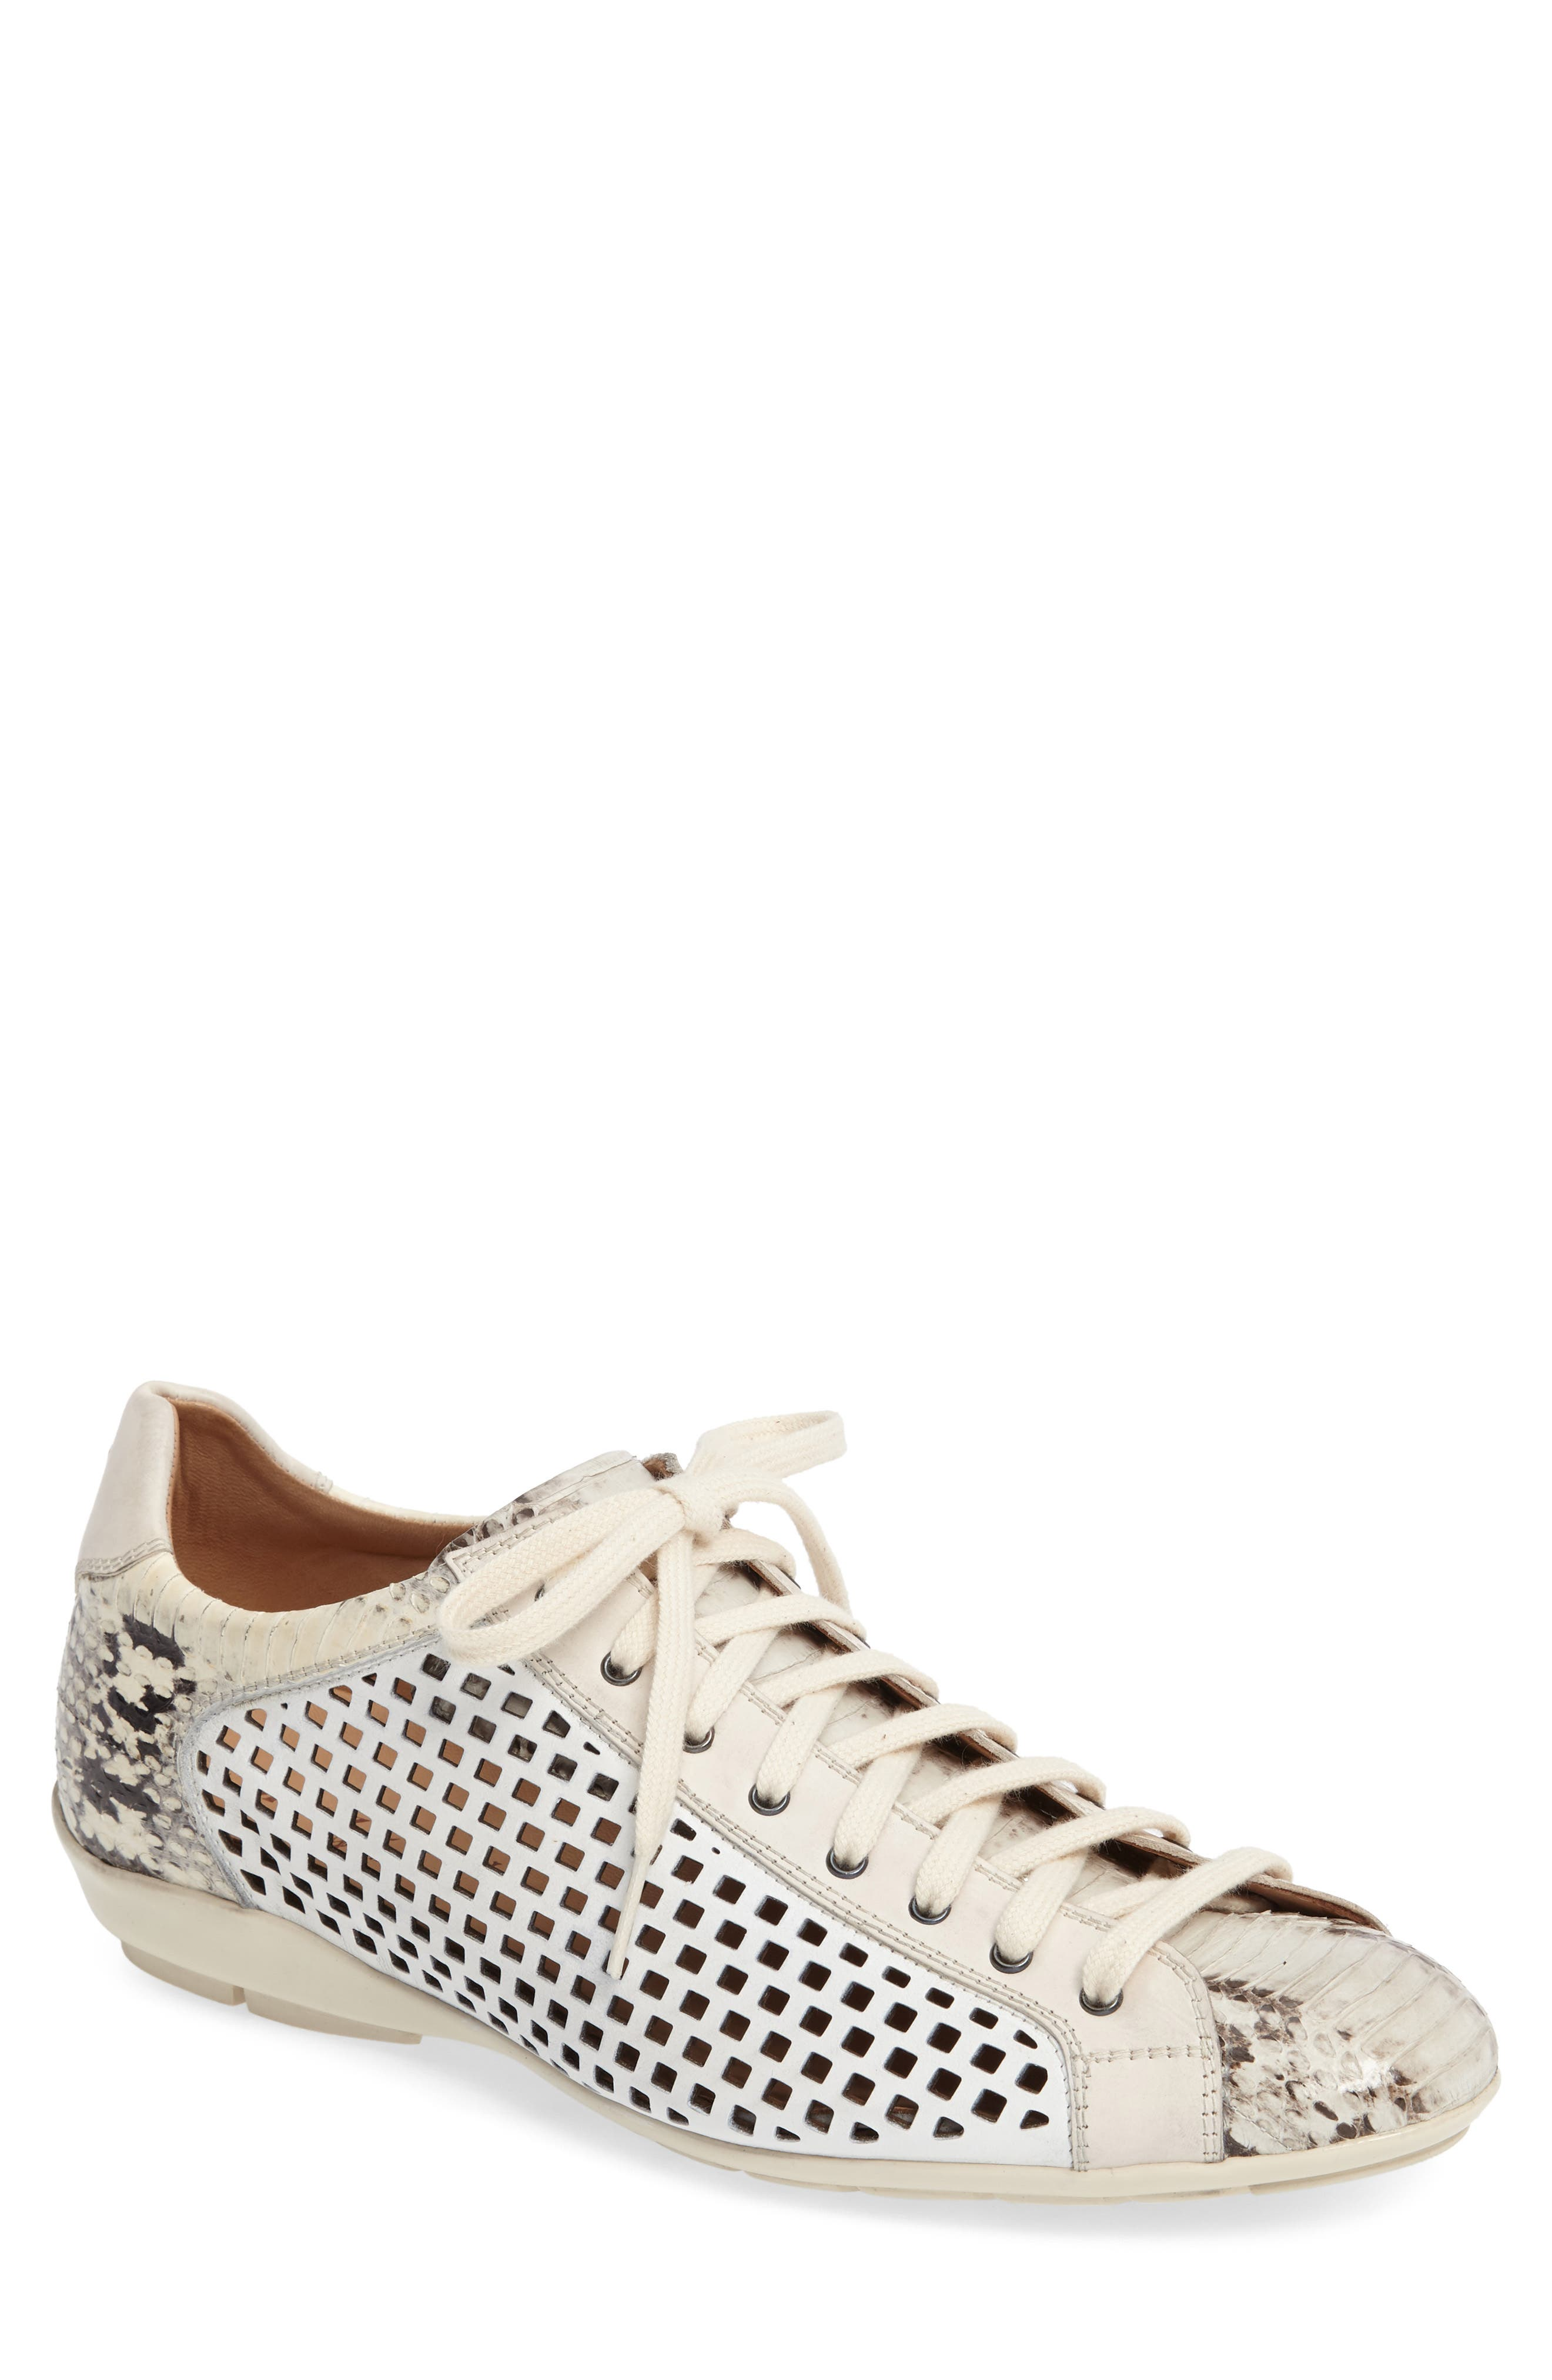 Scharf Sneaker,                             Main thumbnail 1, color,                             Bone